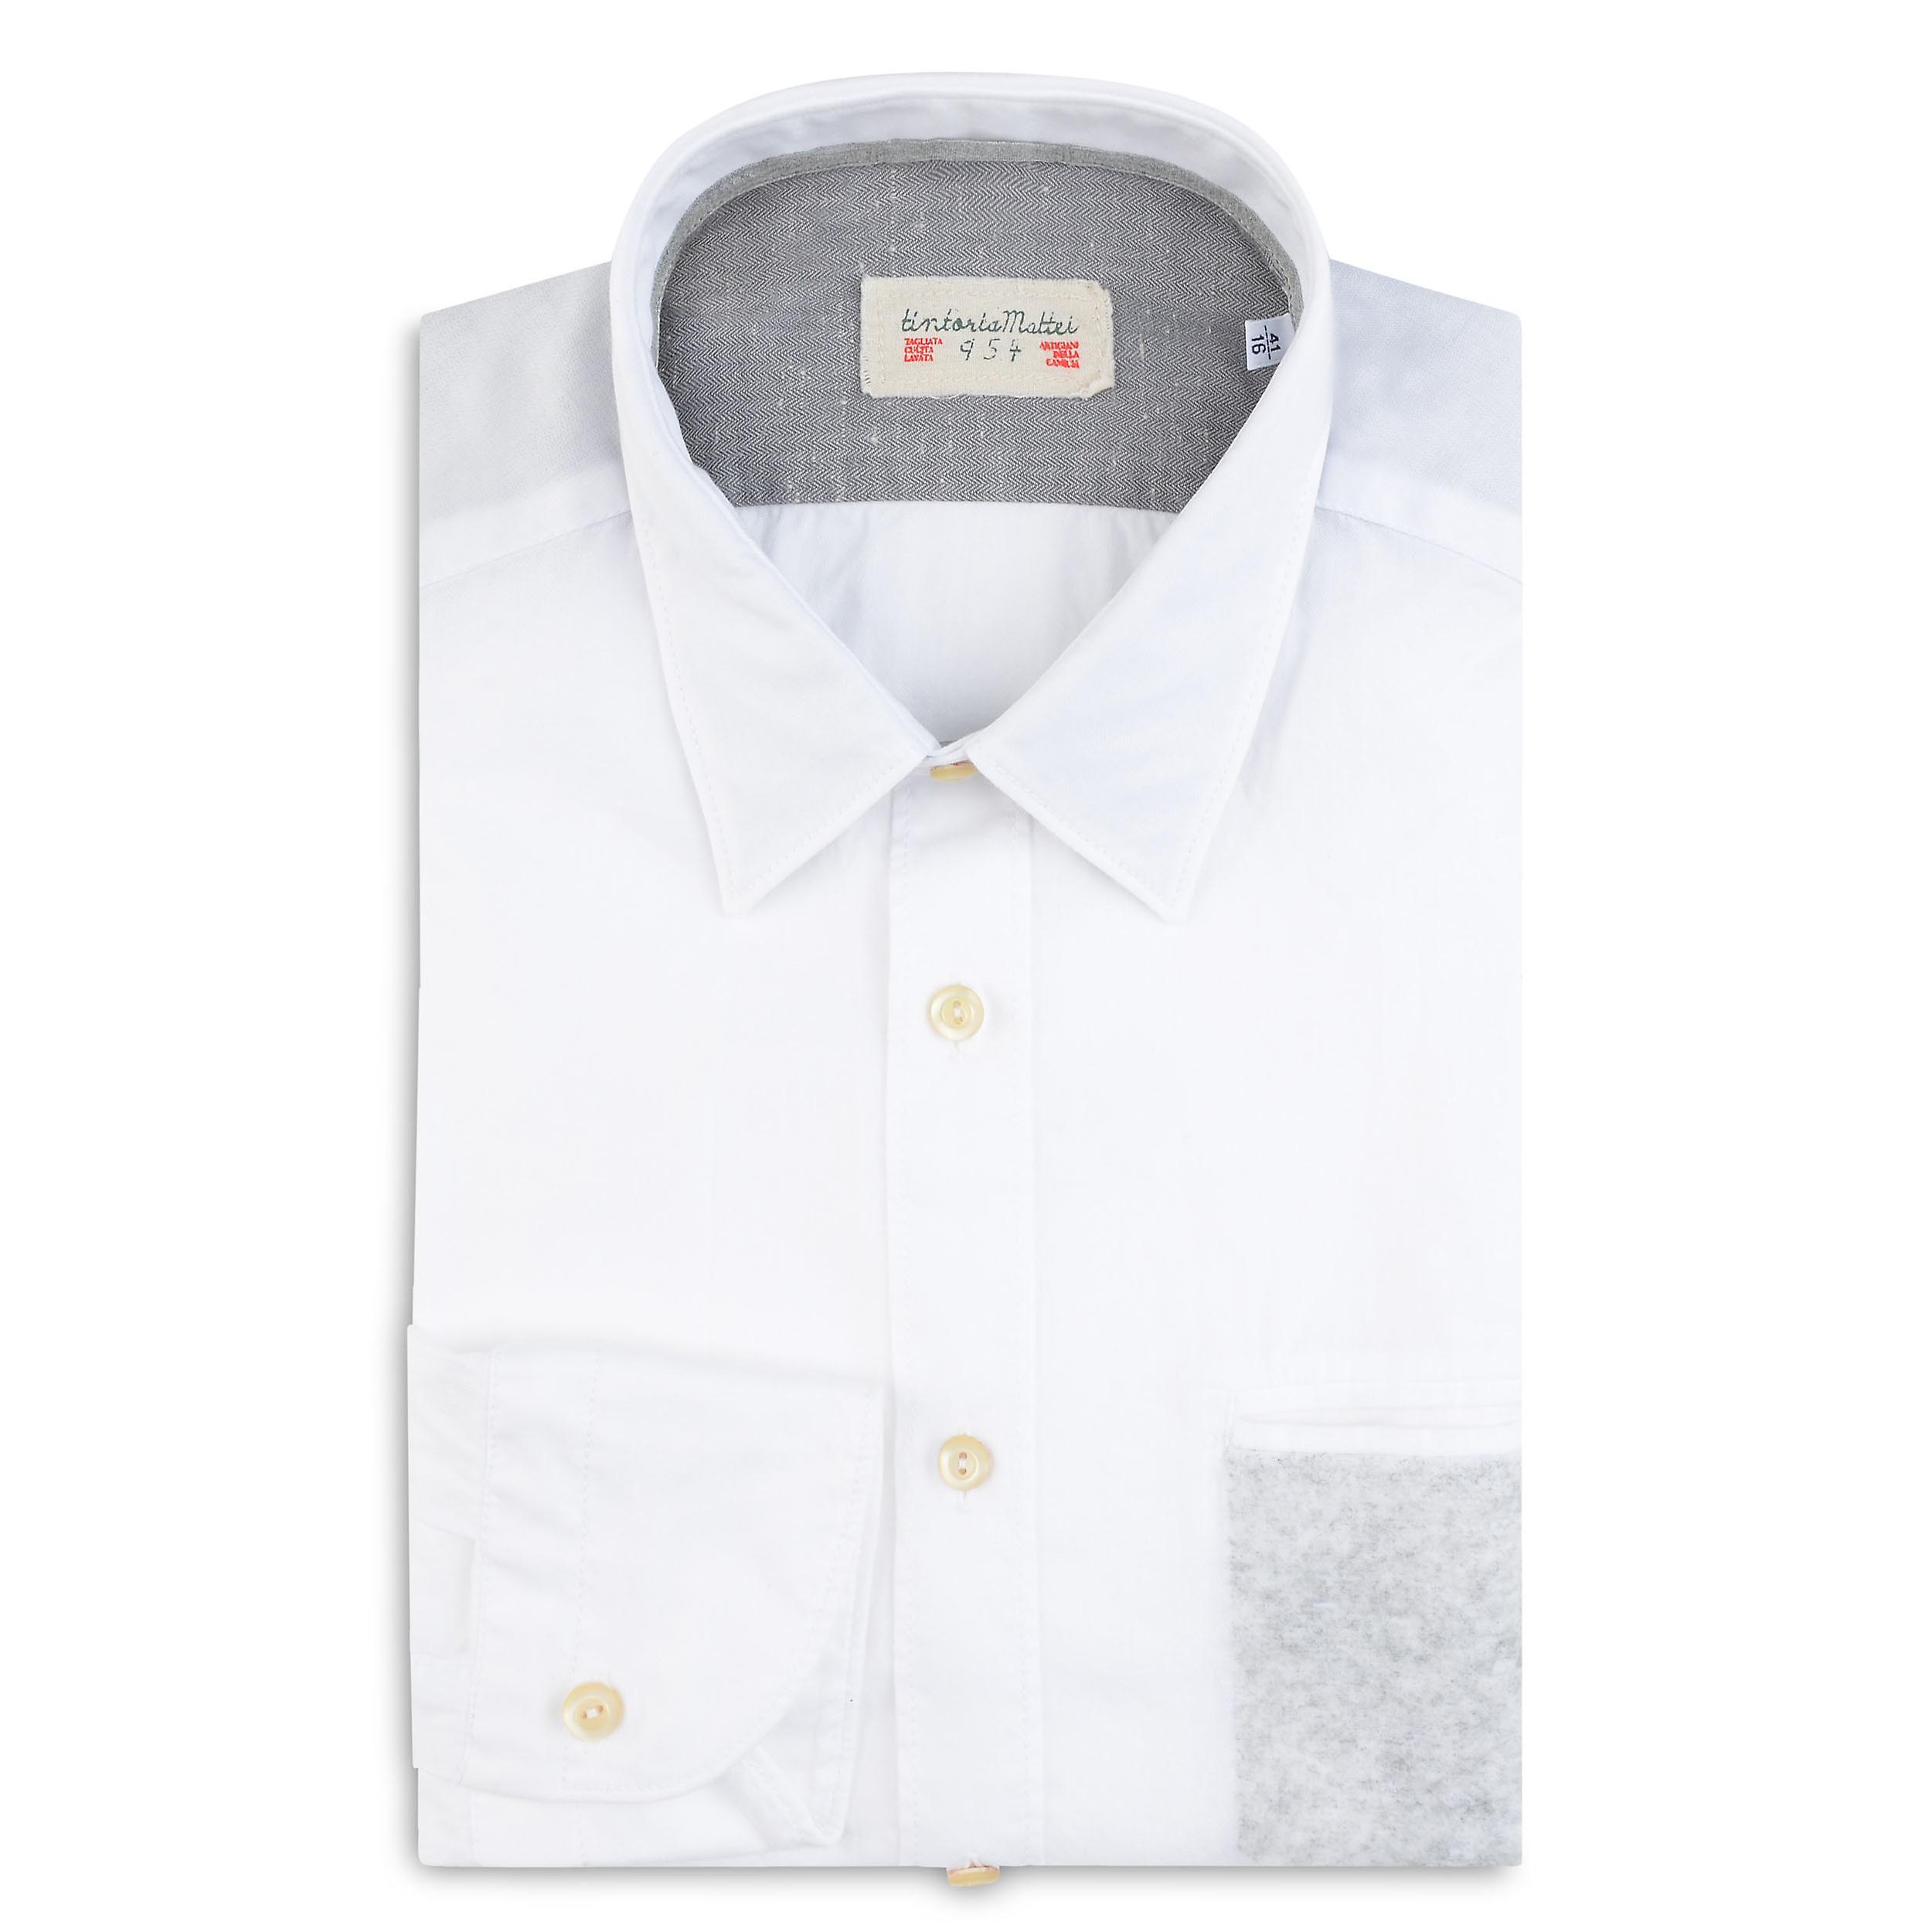 Fabio Giovanni Casalini Shirt - Constructed in Italian herringbone cotton - High Quality Italian Shirt